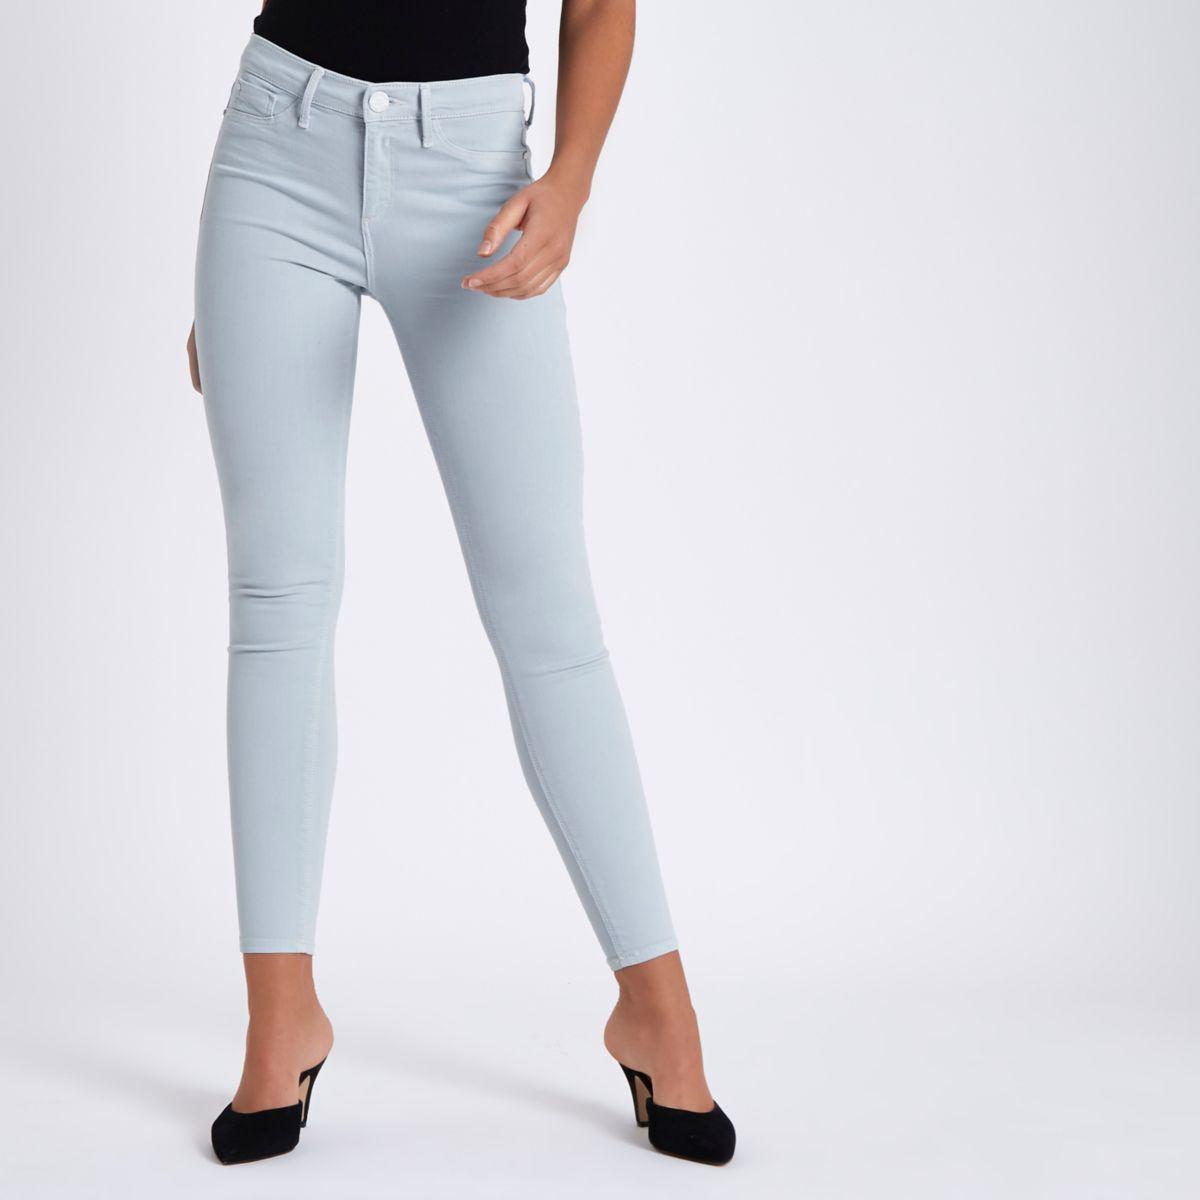 Light blue Molly super skinny jeans